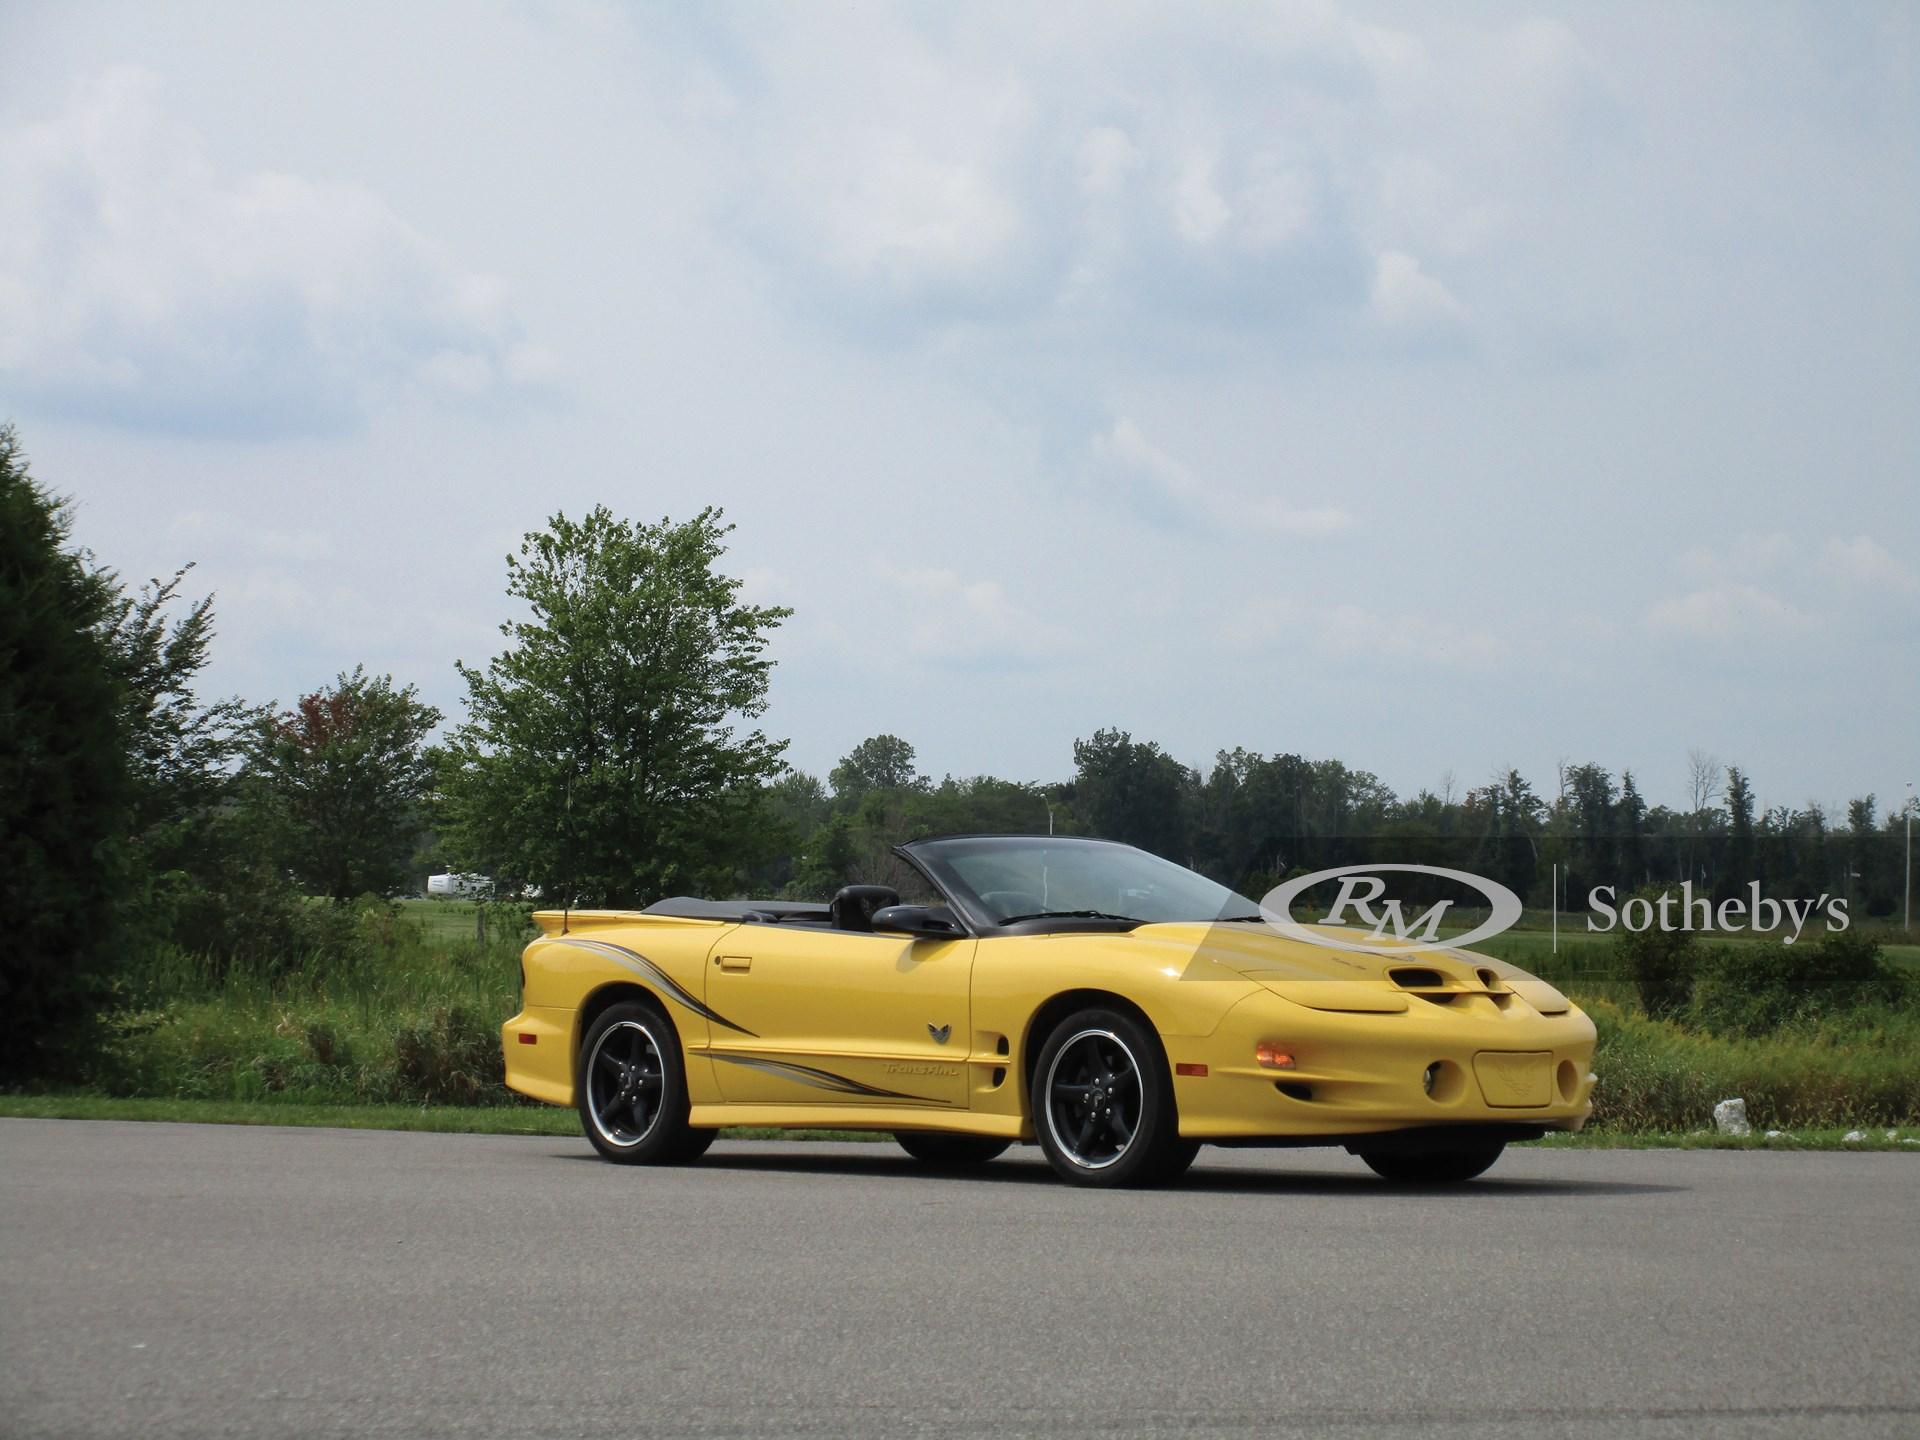 2002 Pontiac Firebird Trans Am 35th Anniversary Collectors Edition